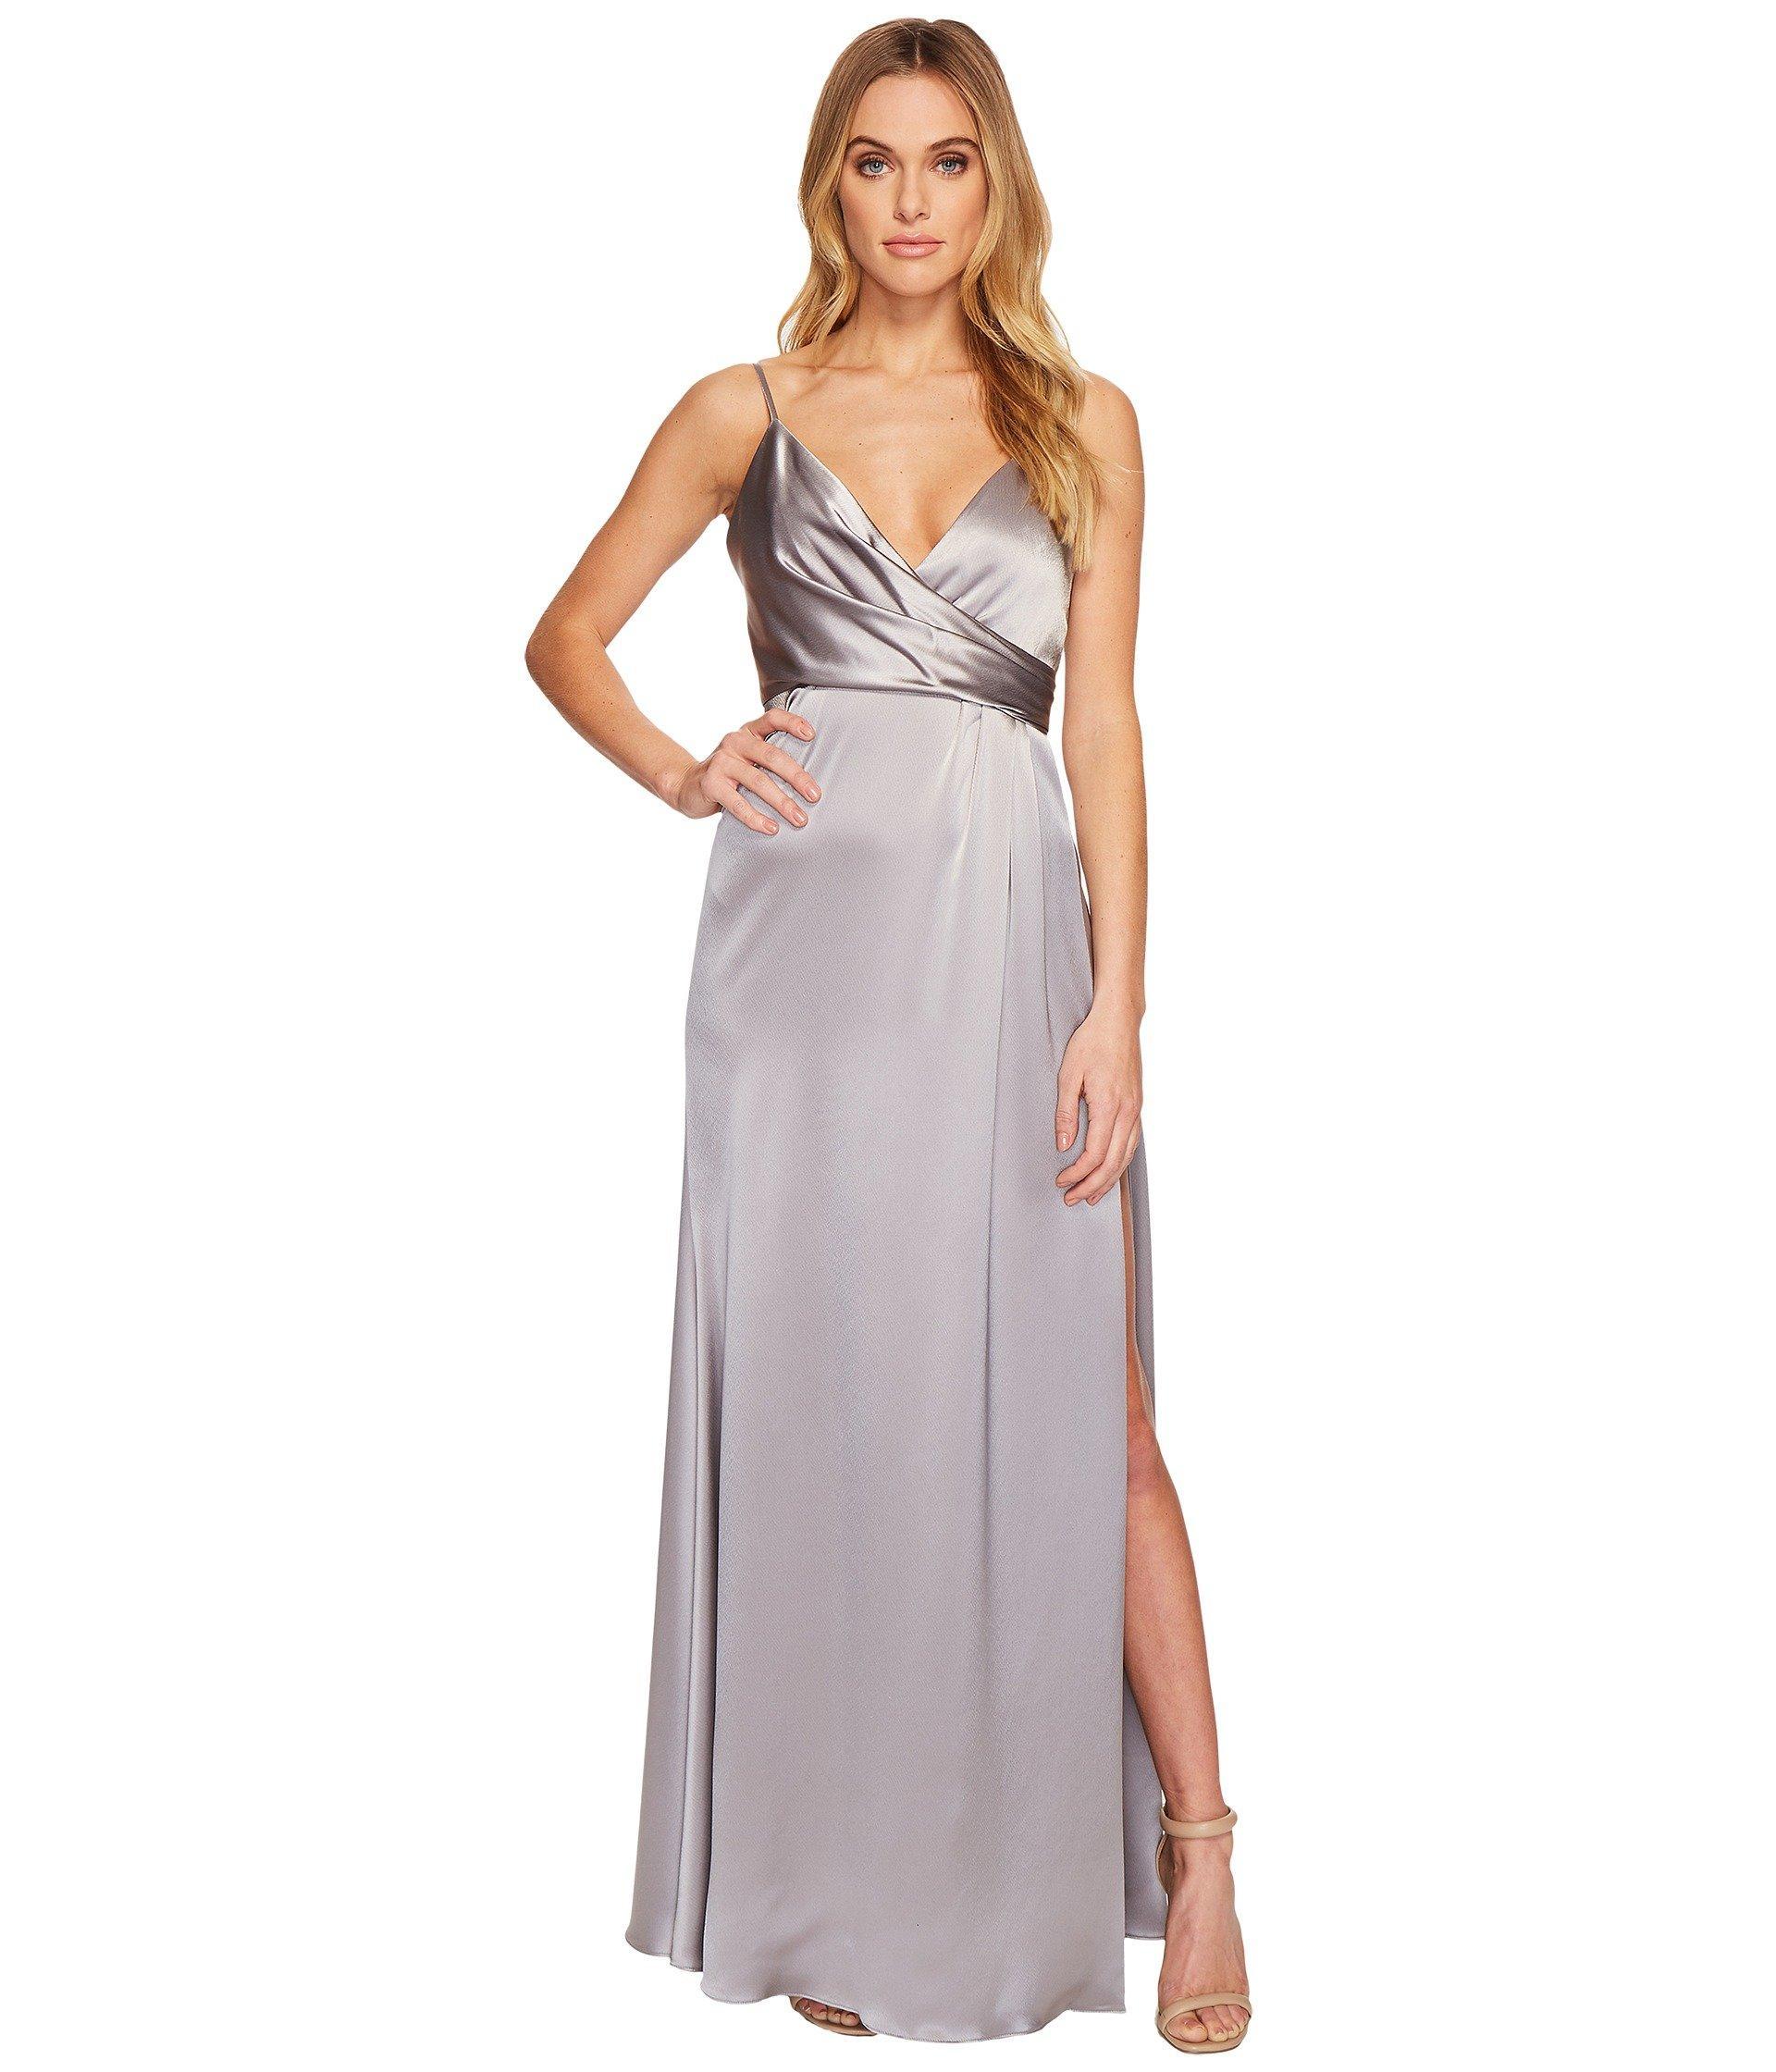 81617d57e9cda Jill Jill Stuart Satin Back Crepe Slip Dress, Silver/Grey | ModeSens